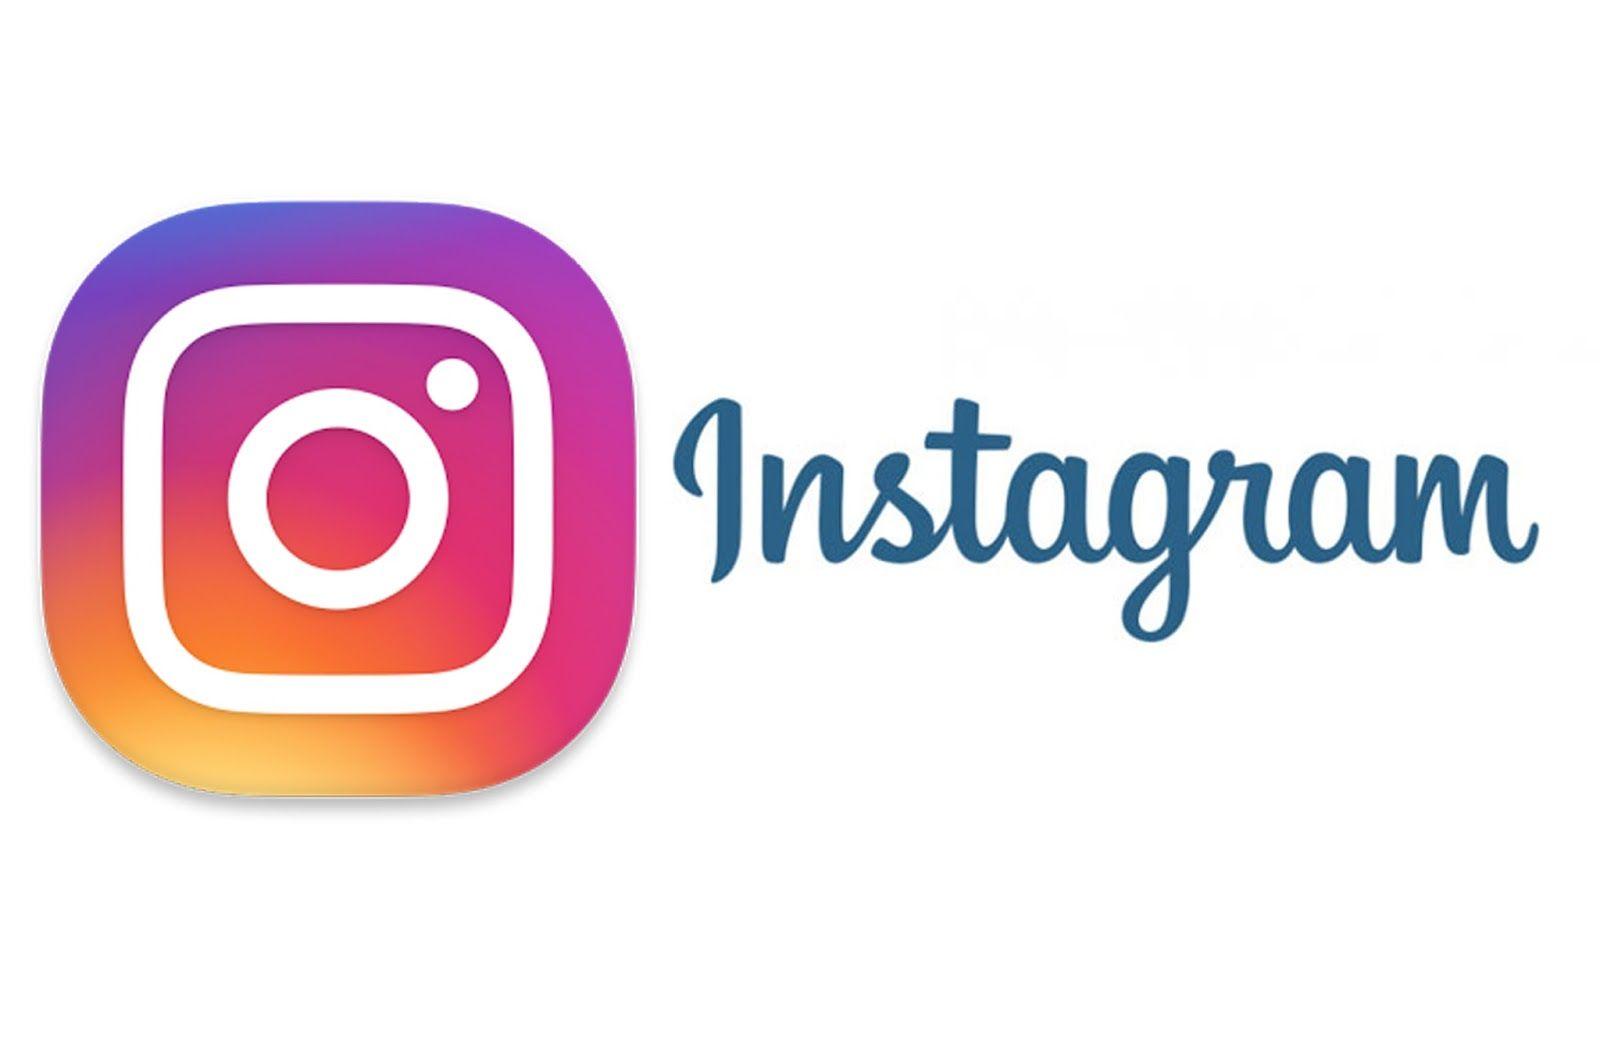 1000 Best Instagram Bios Good, Funny, Creative